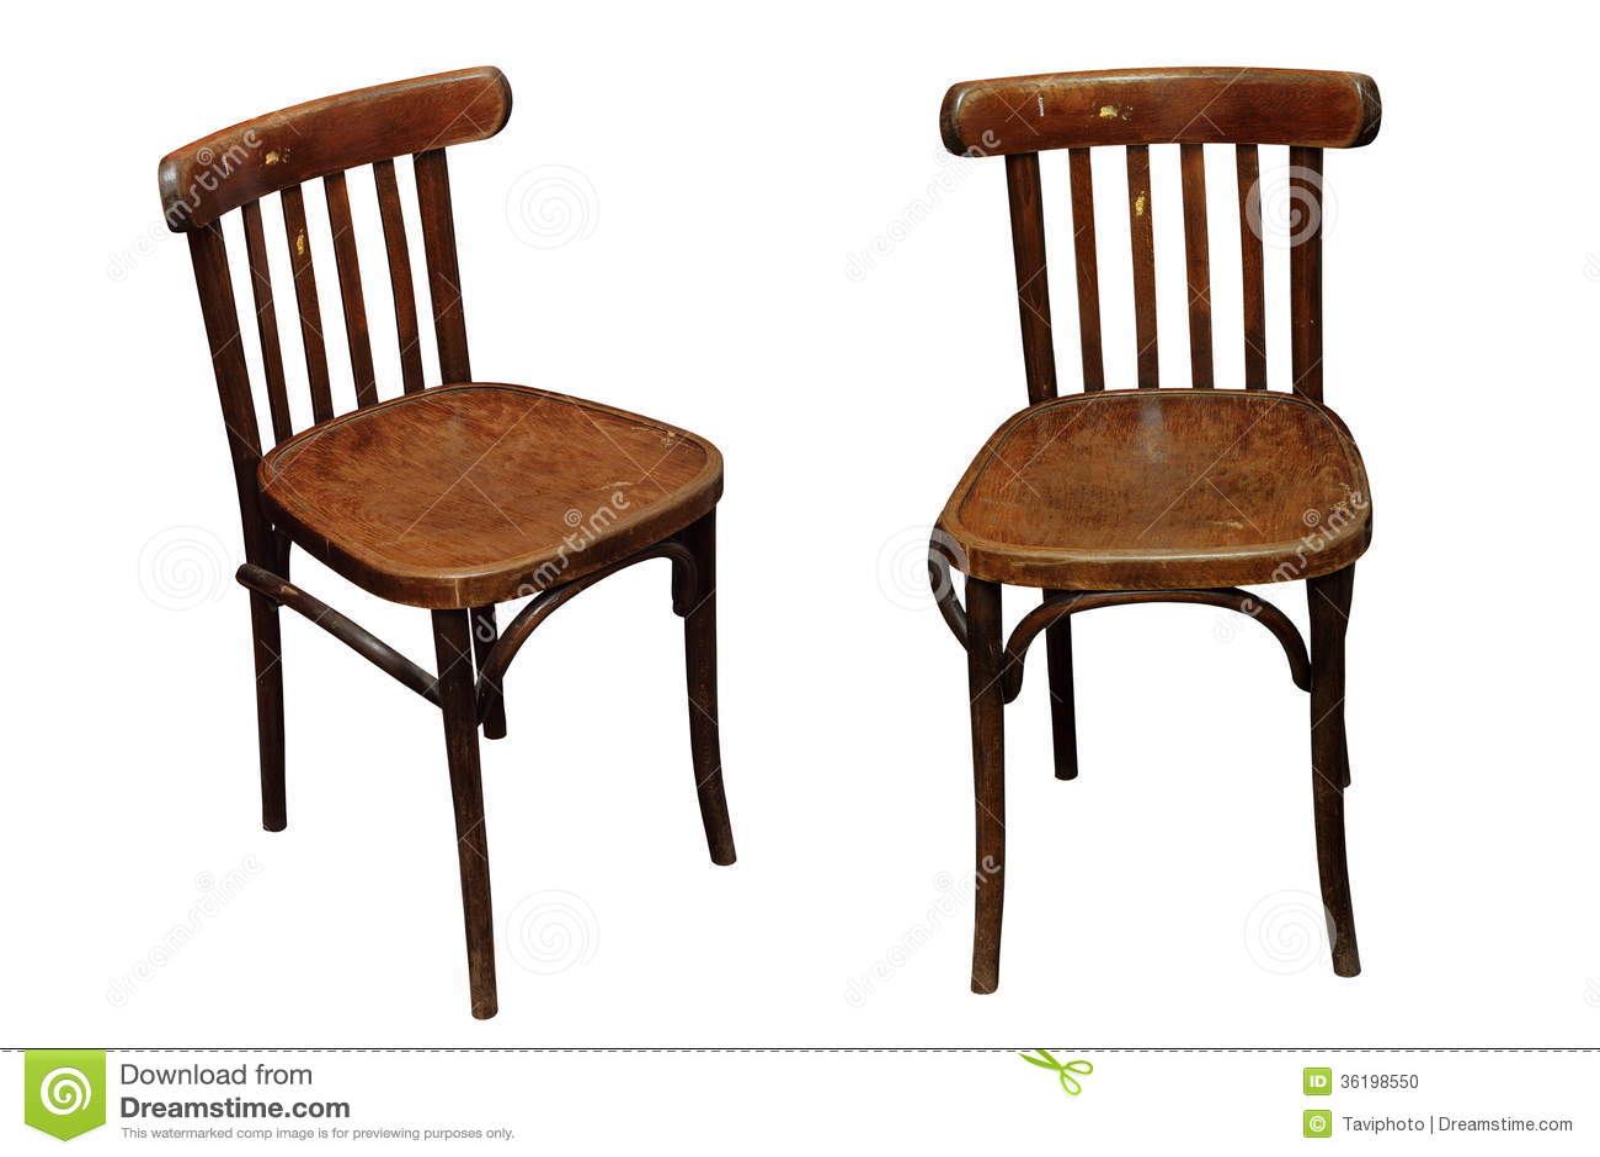 vieilles chaises d 39 isolement photo stock image 36198550. Black Bedroom Furniture Sets. Home Design Ideas